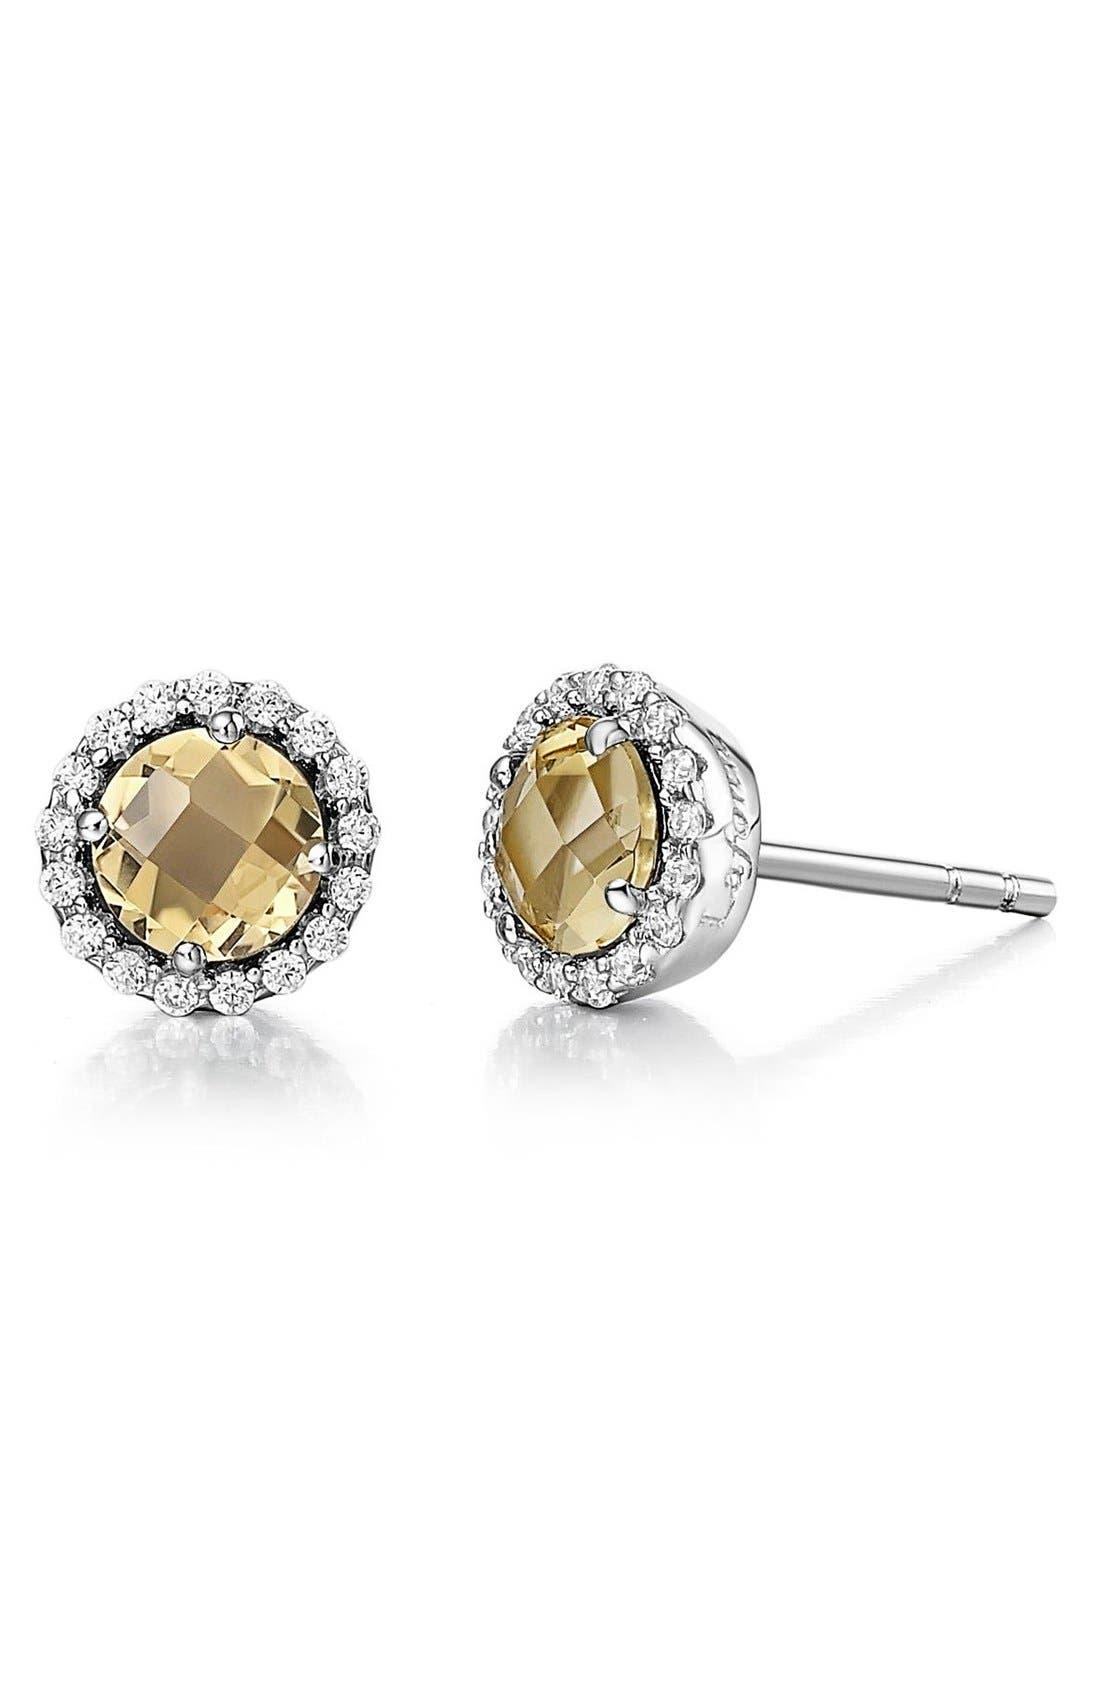 Main Image - Lafonn Birthstone Stud Earrings